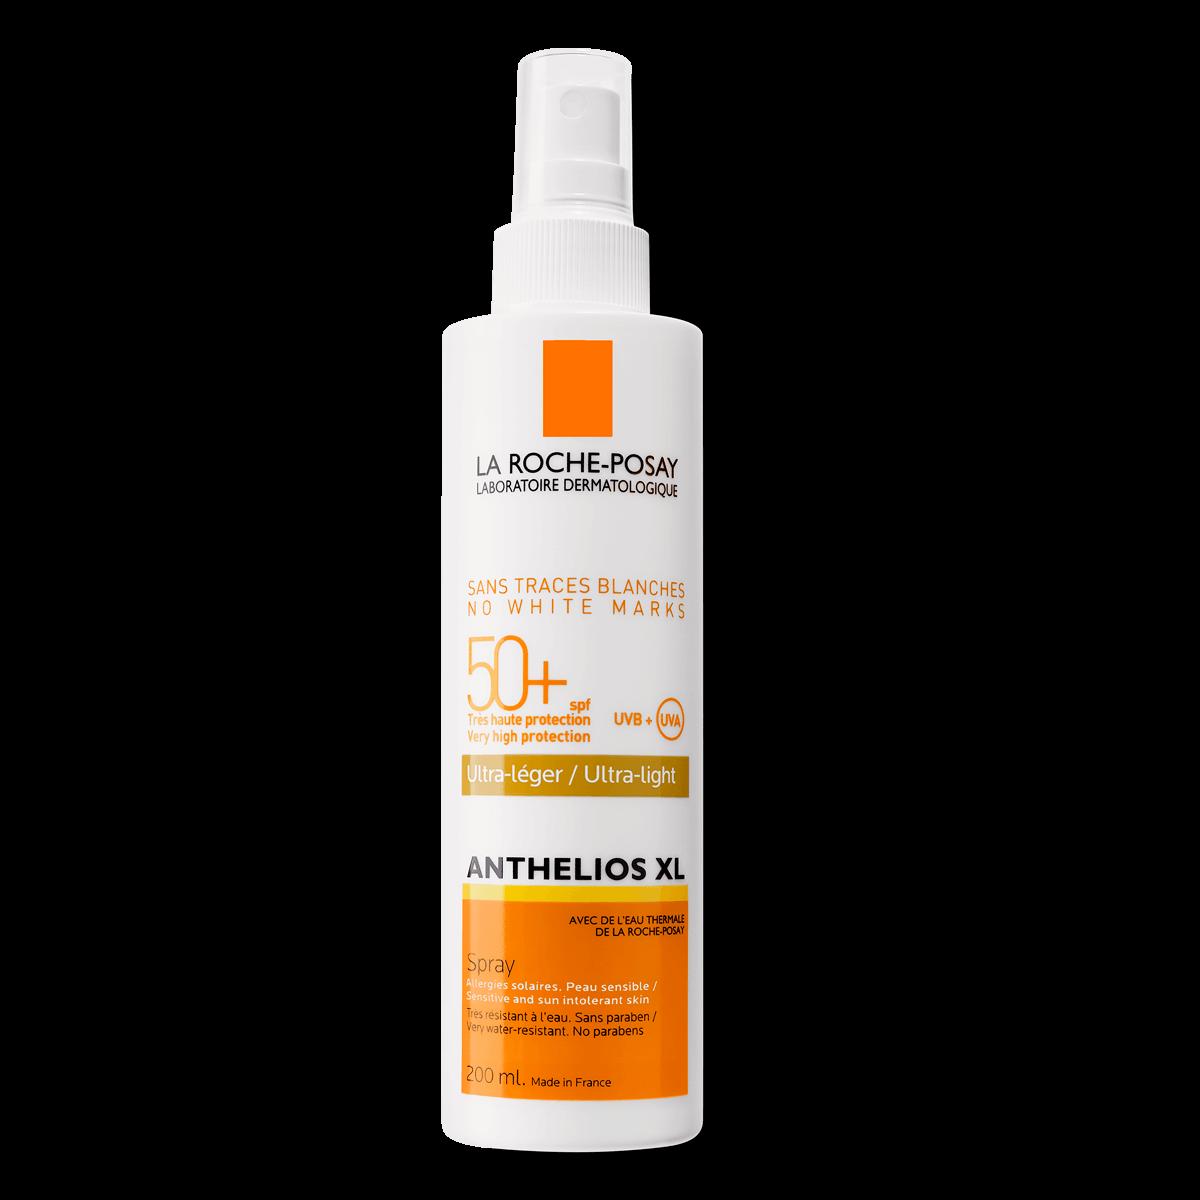 La Roche Posay ProductPage Sun Anthelios XL Ultra Light Spray Spf50 20